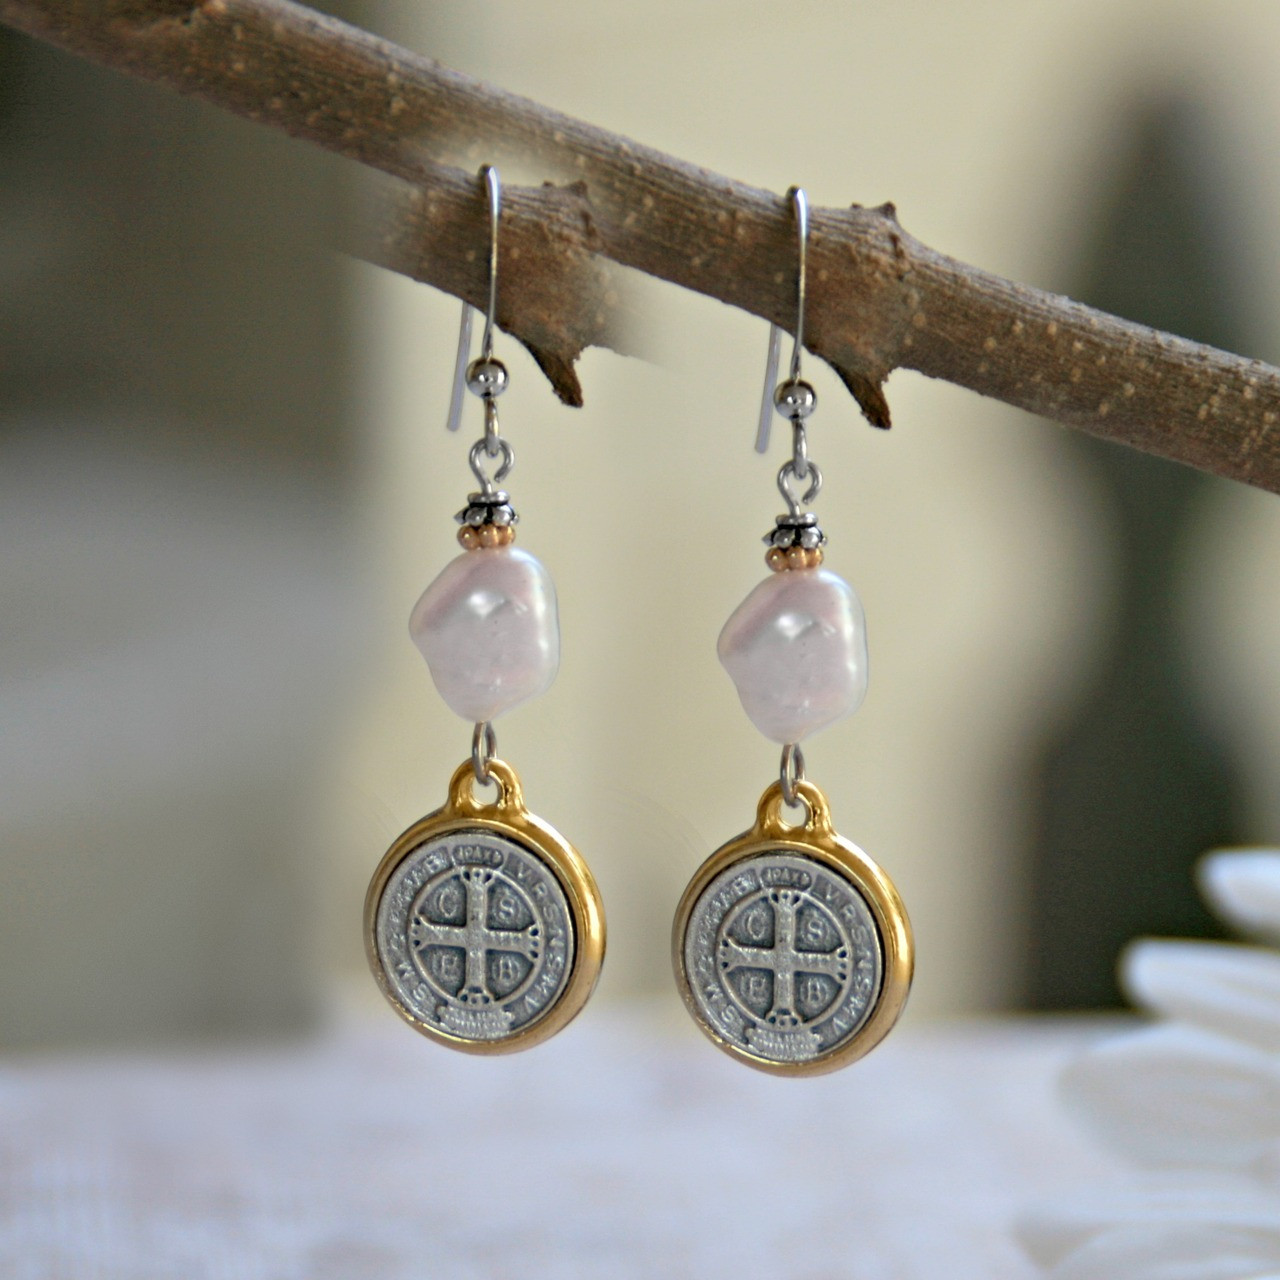 IN-36  St. Benedict Freshwater Pearl Earrings